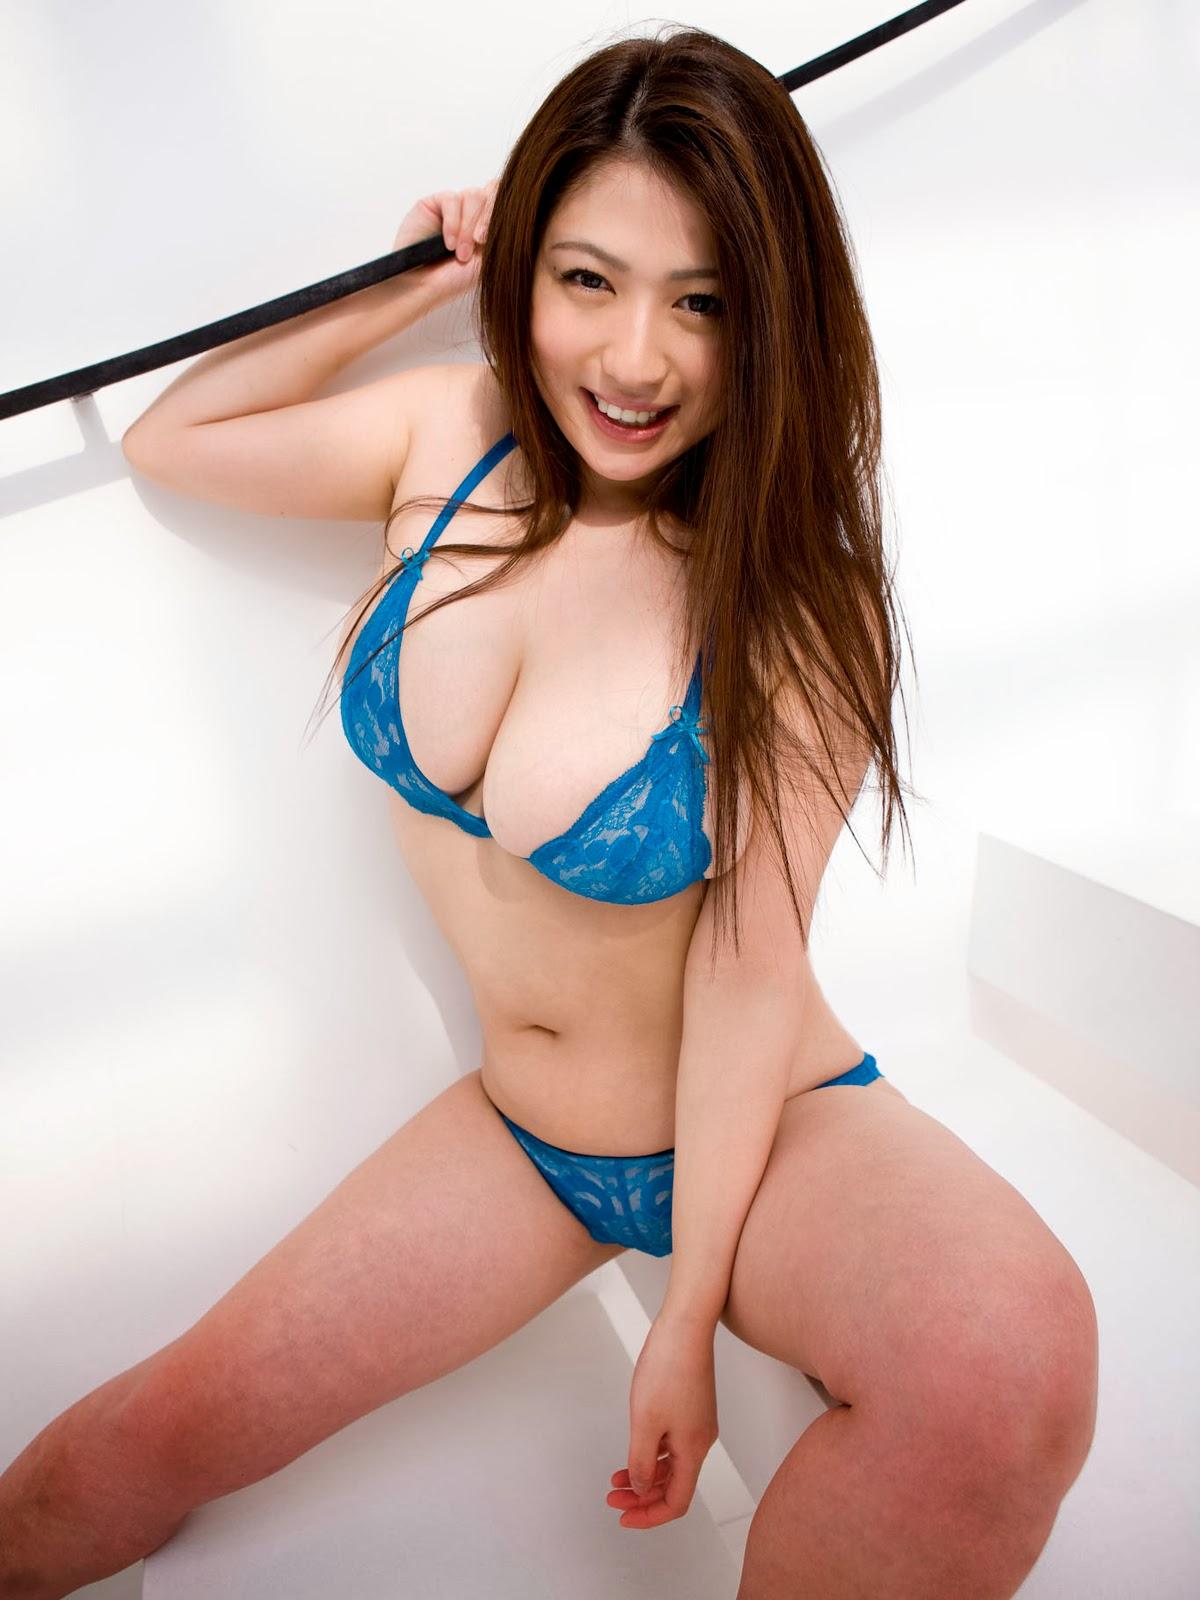 Nonami Takizawa - NUDE Photo Galleries